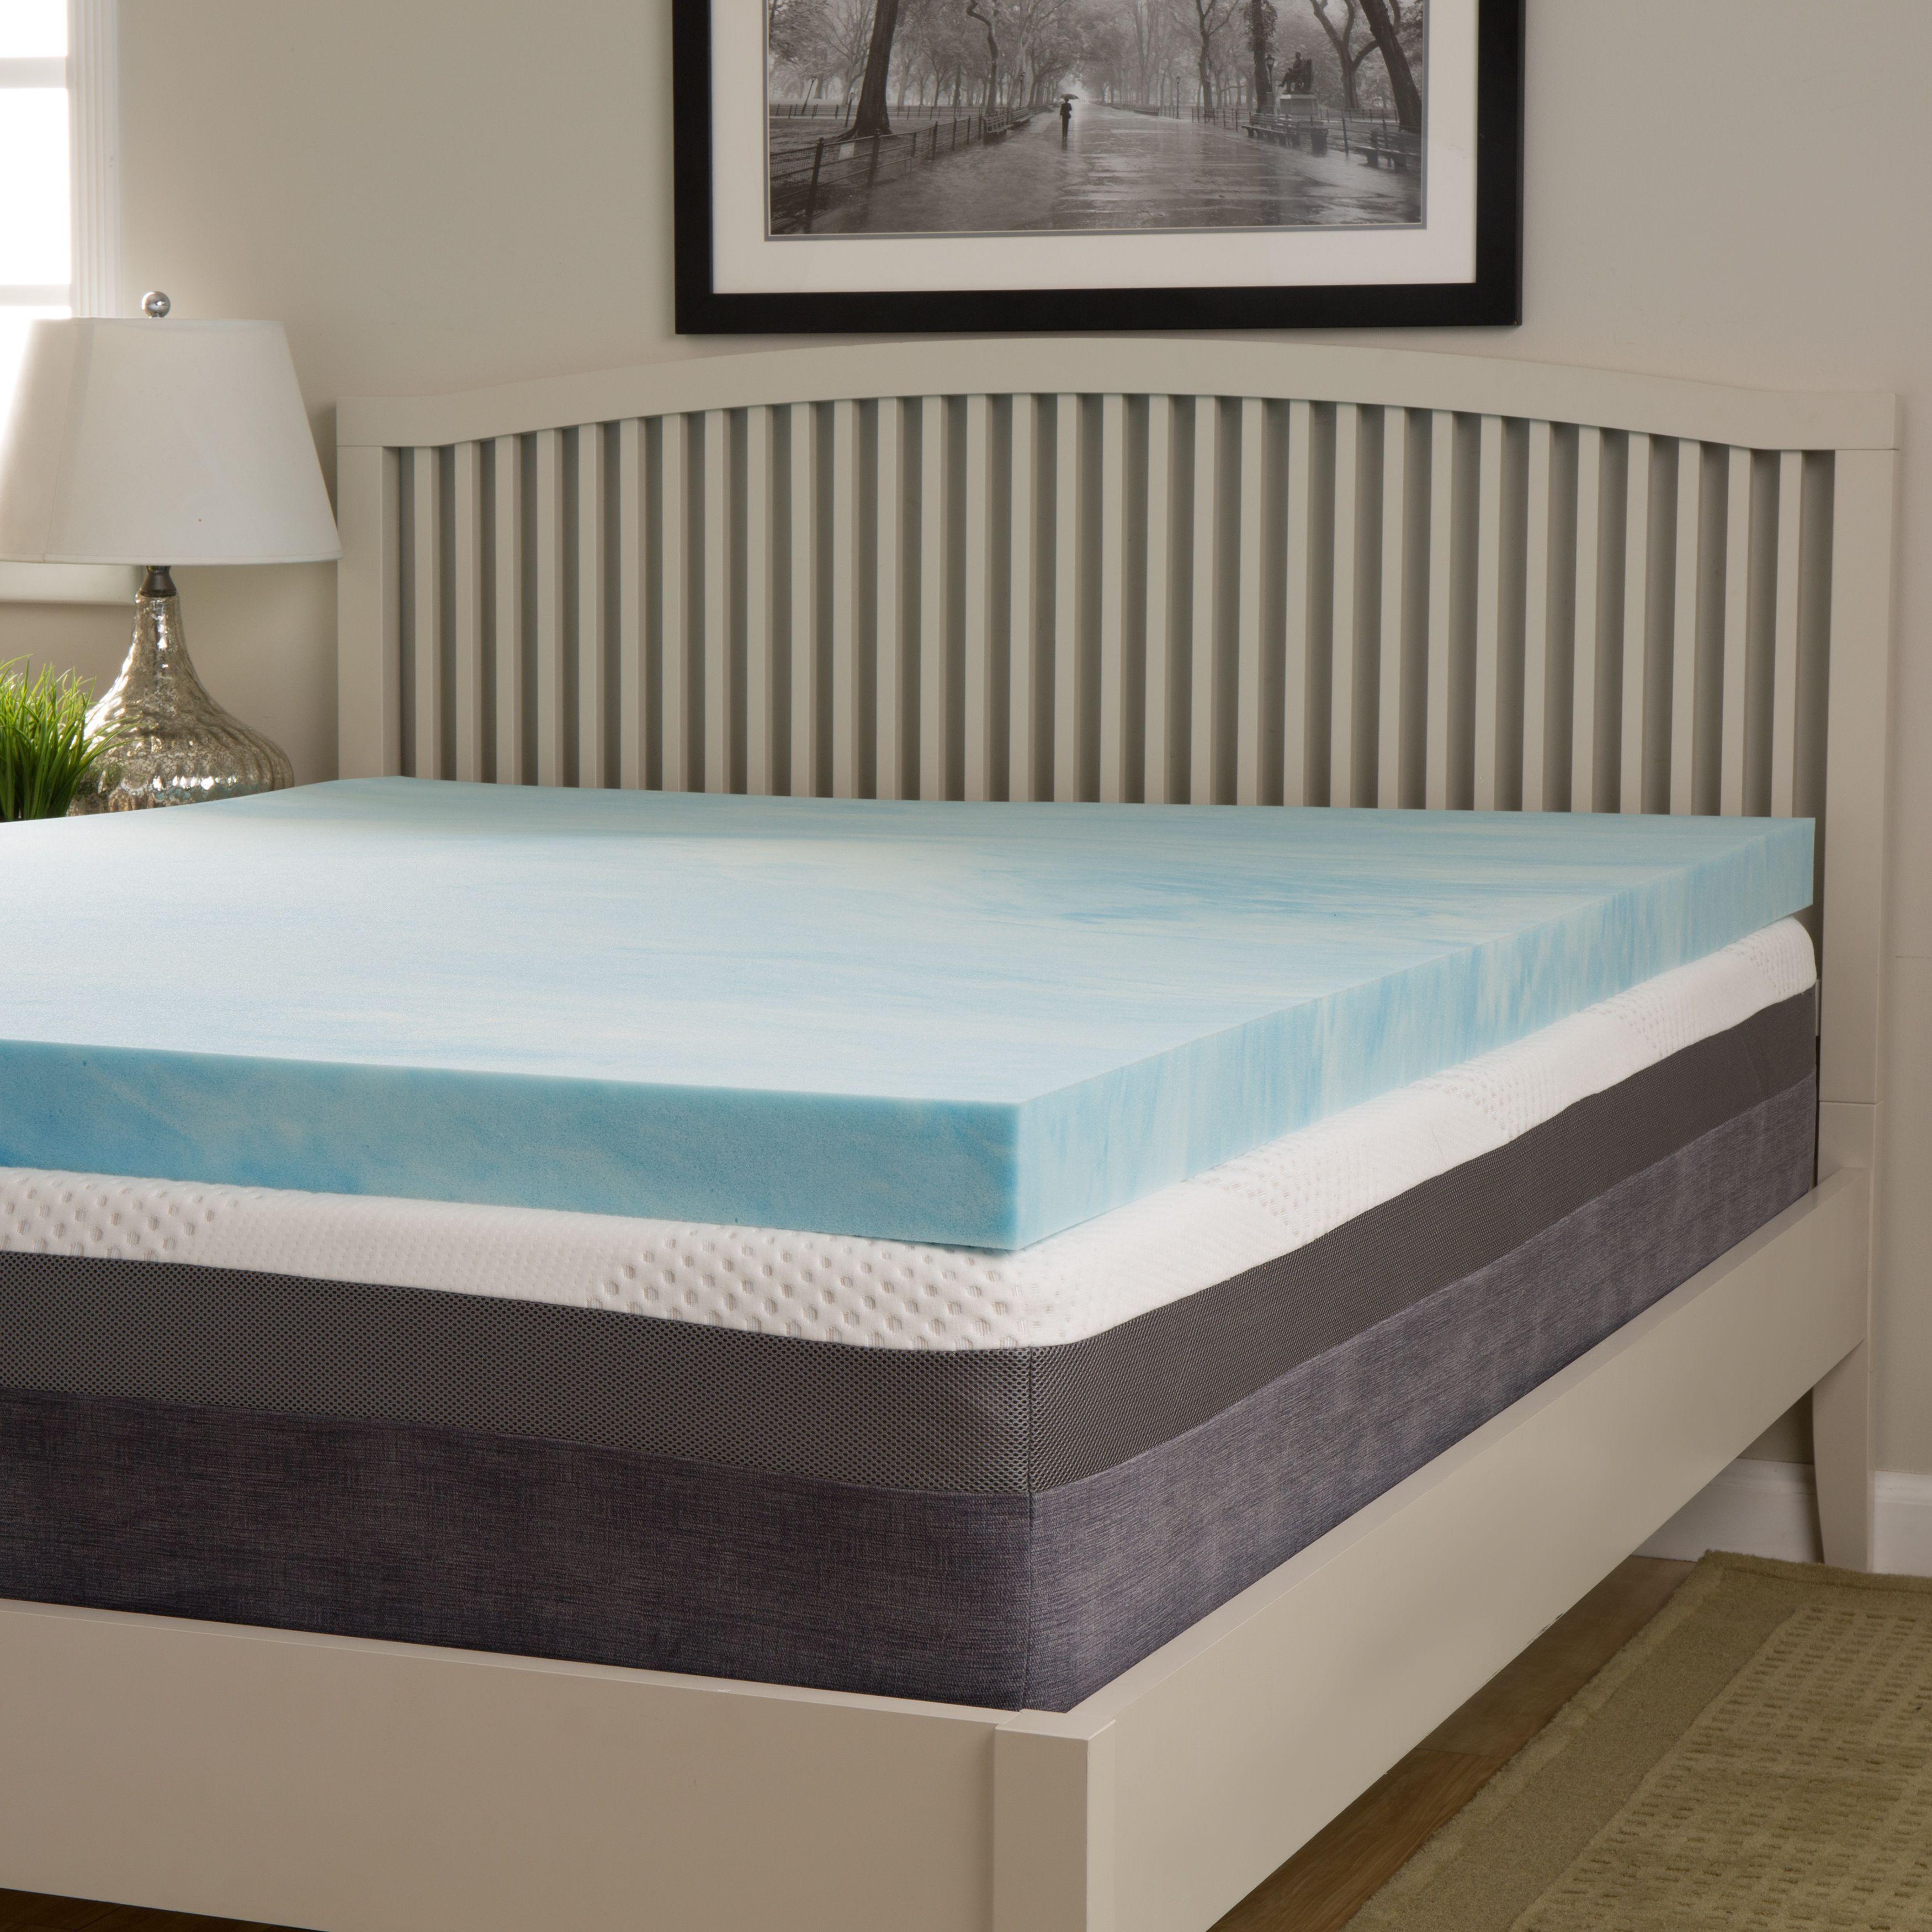 Slumber Solutions Choose Your Comfort 2 Inch Gel Memory Foam